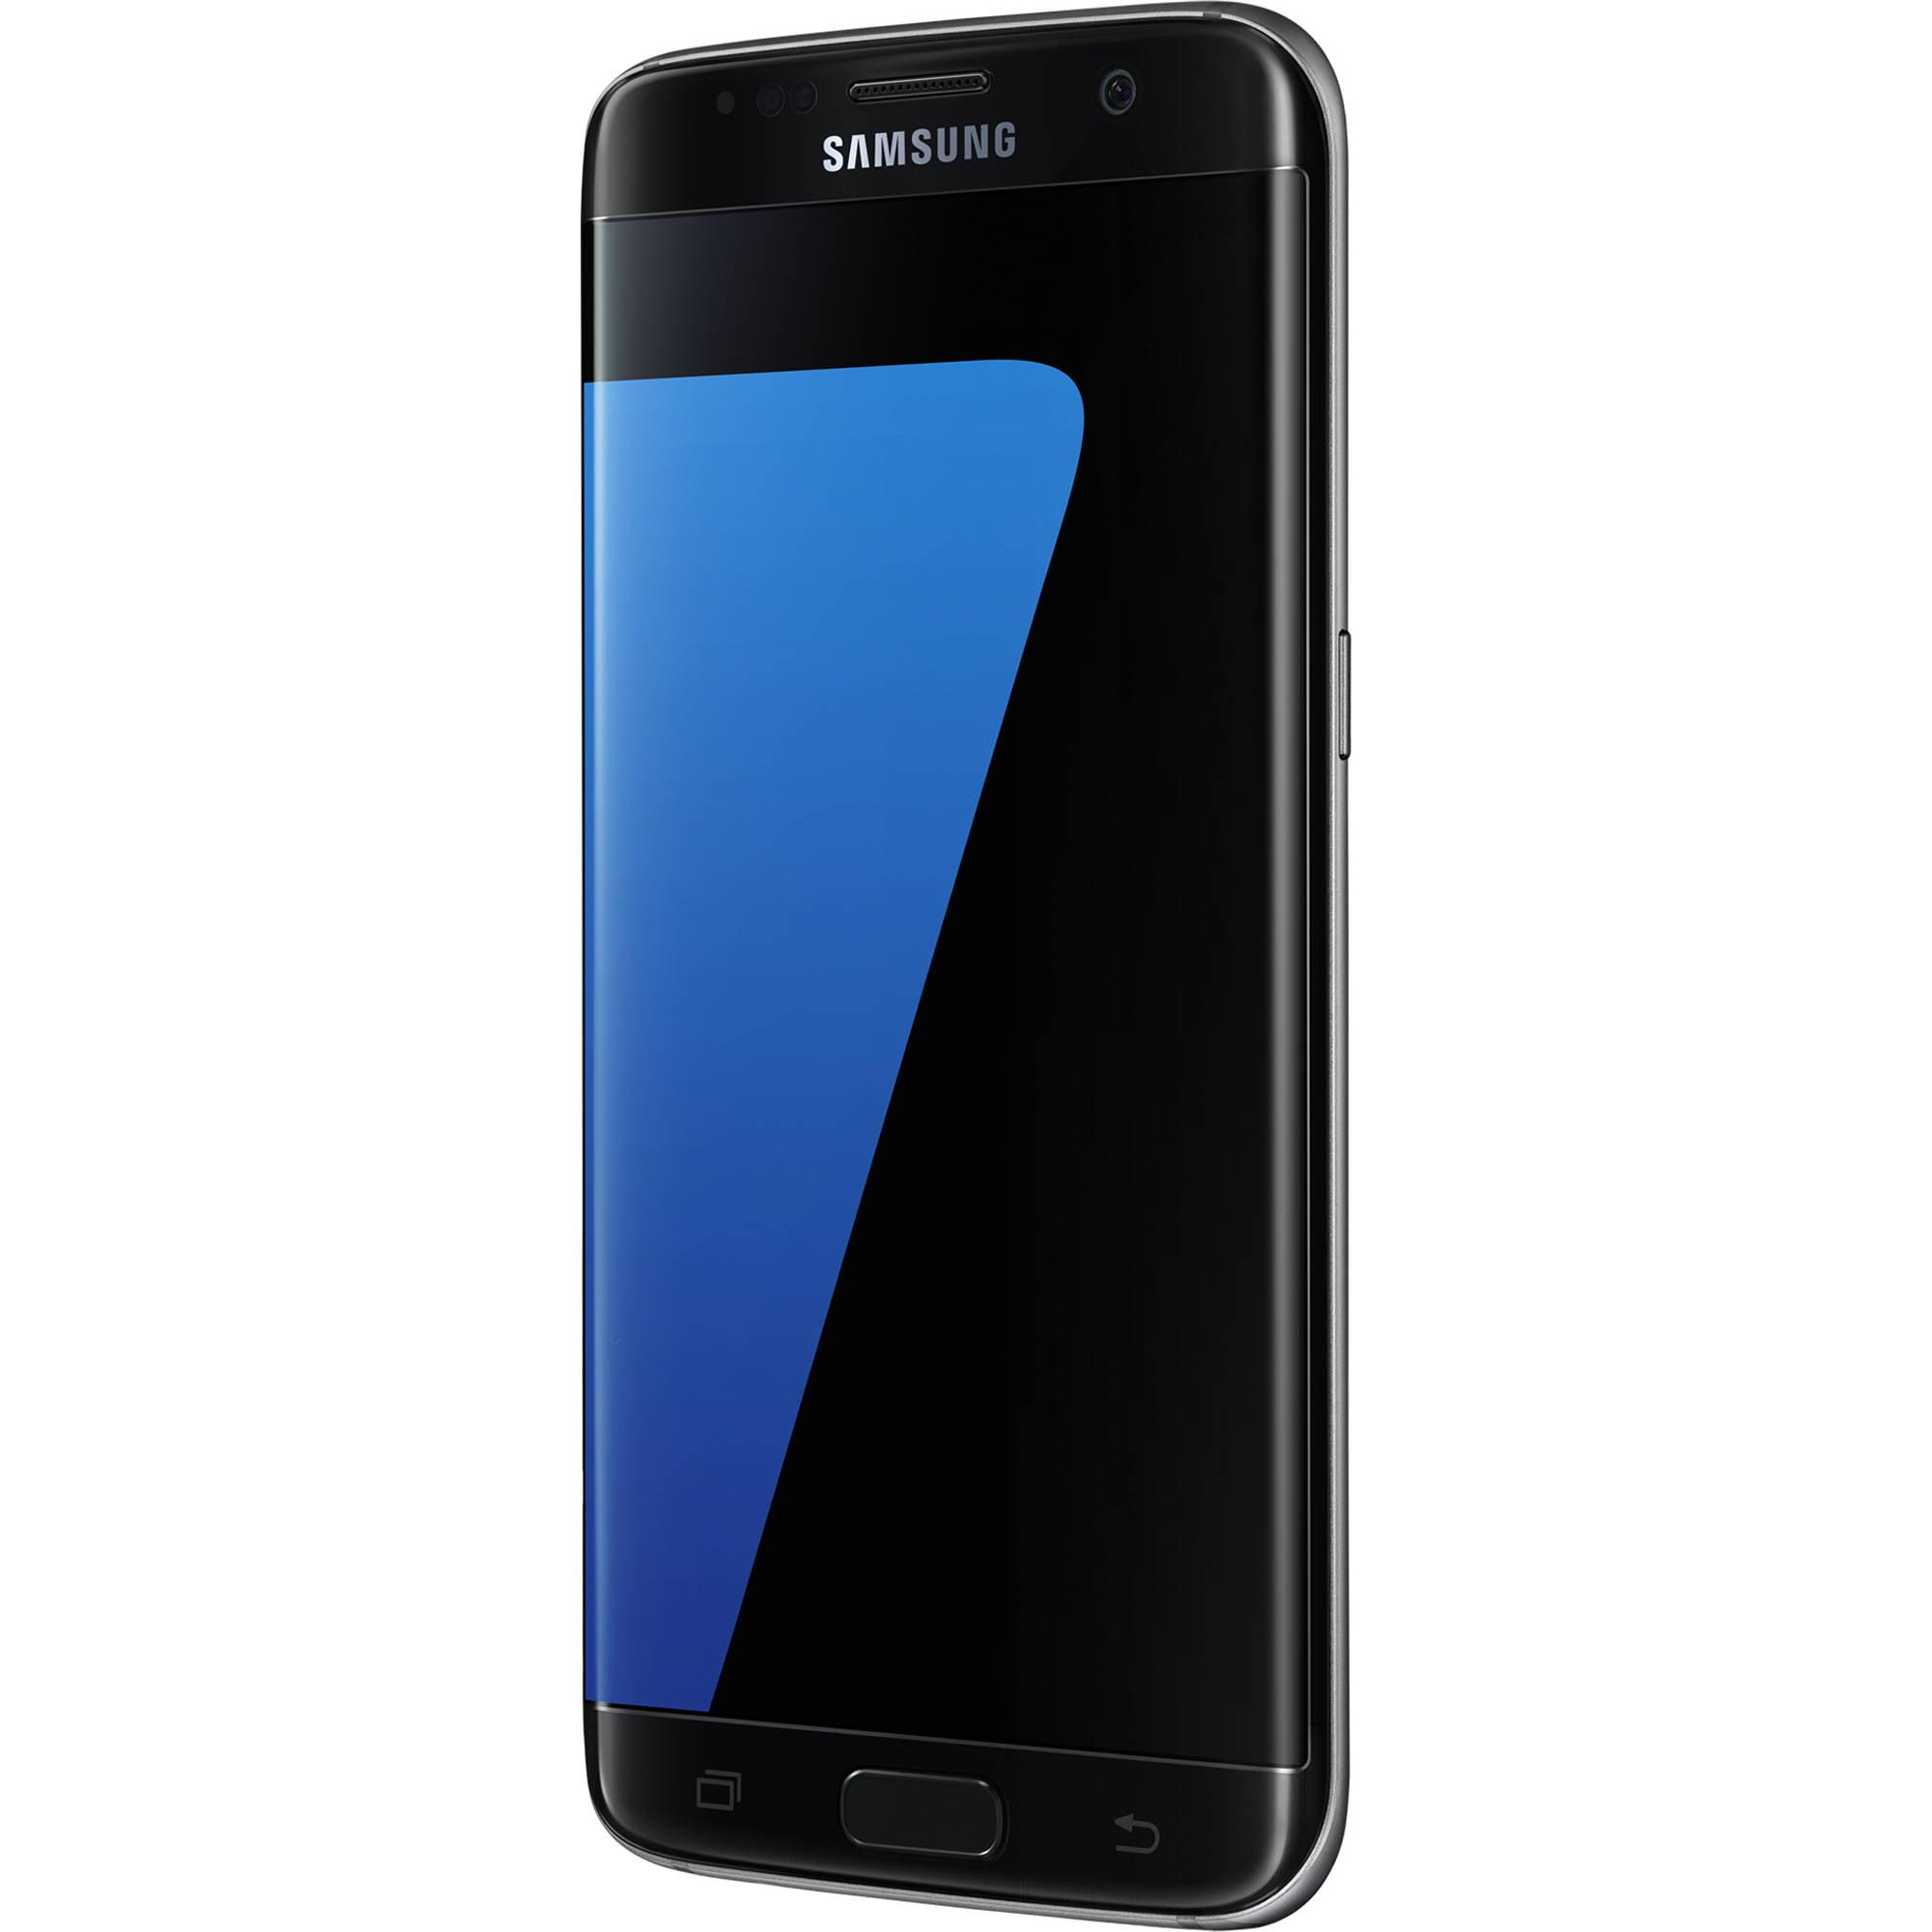 e24b35f9d Samsung Galaxy S7 Edge 32GB Unlocked Smartphone